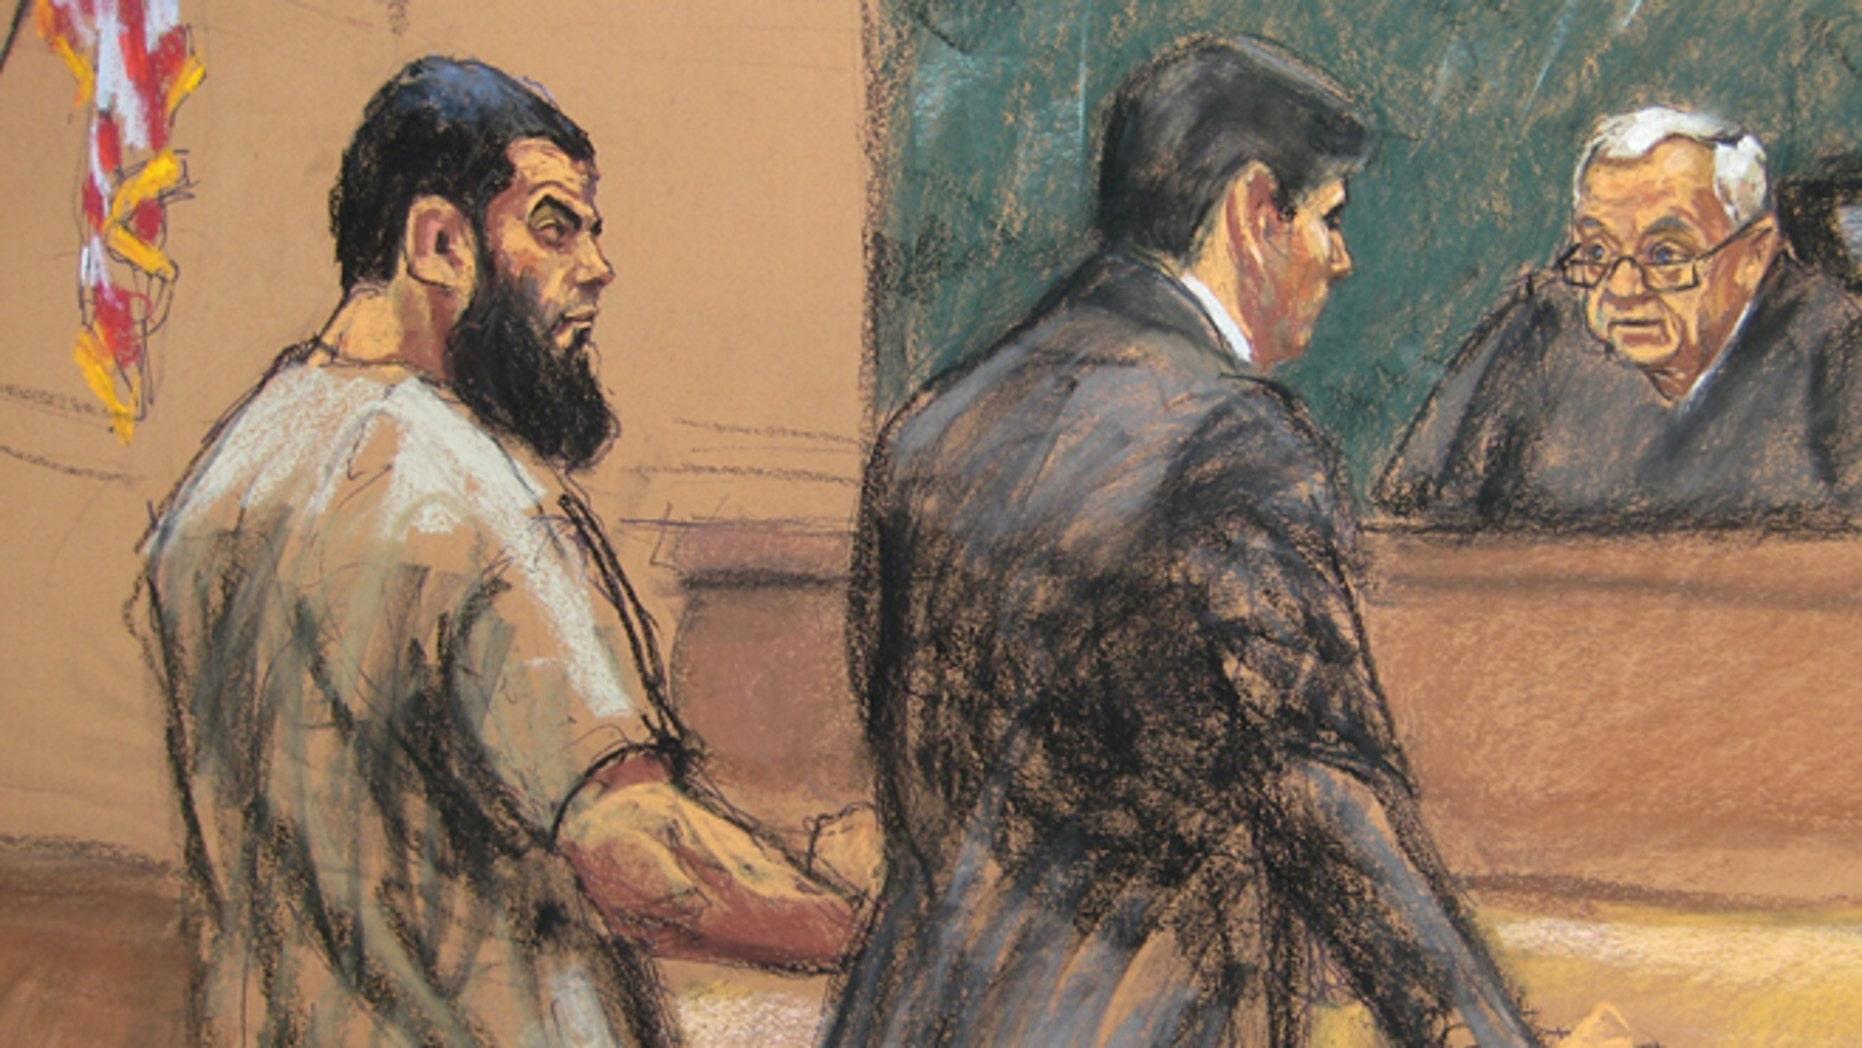 Nov. 24, 2015: A courtroom sketch of Abid Naseer being sentenced by a judge.